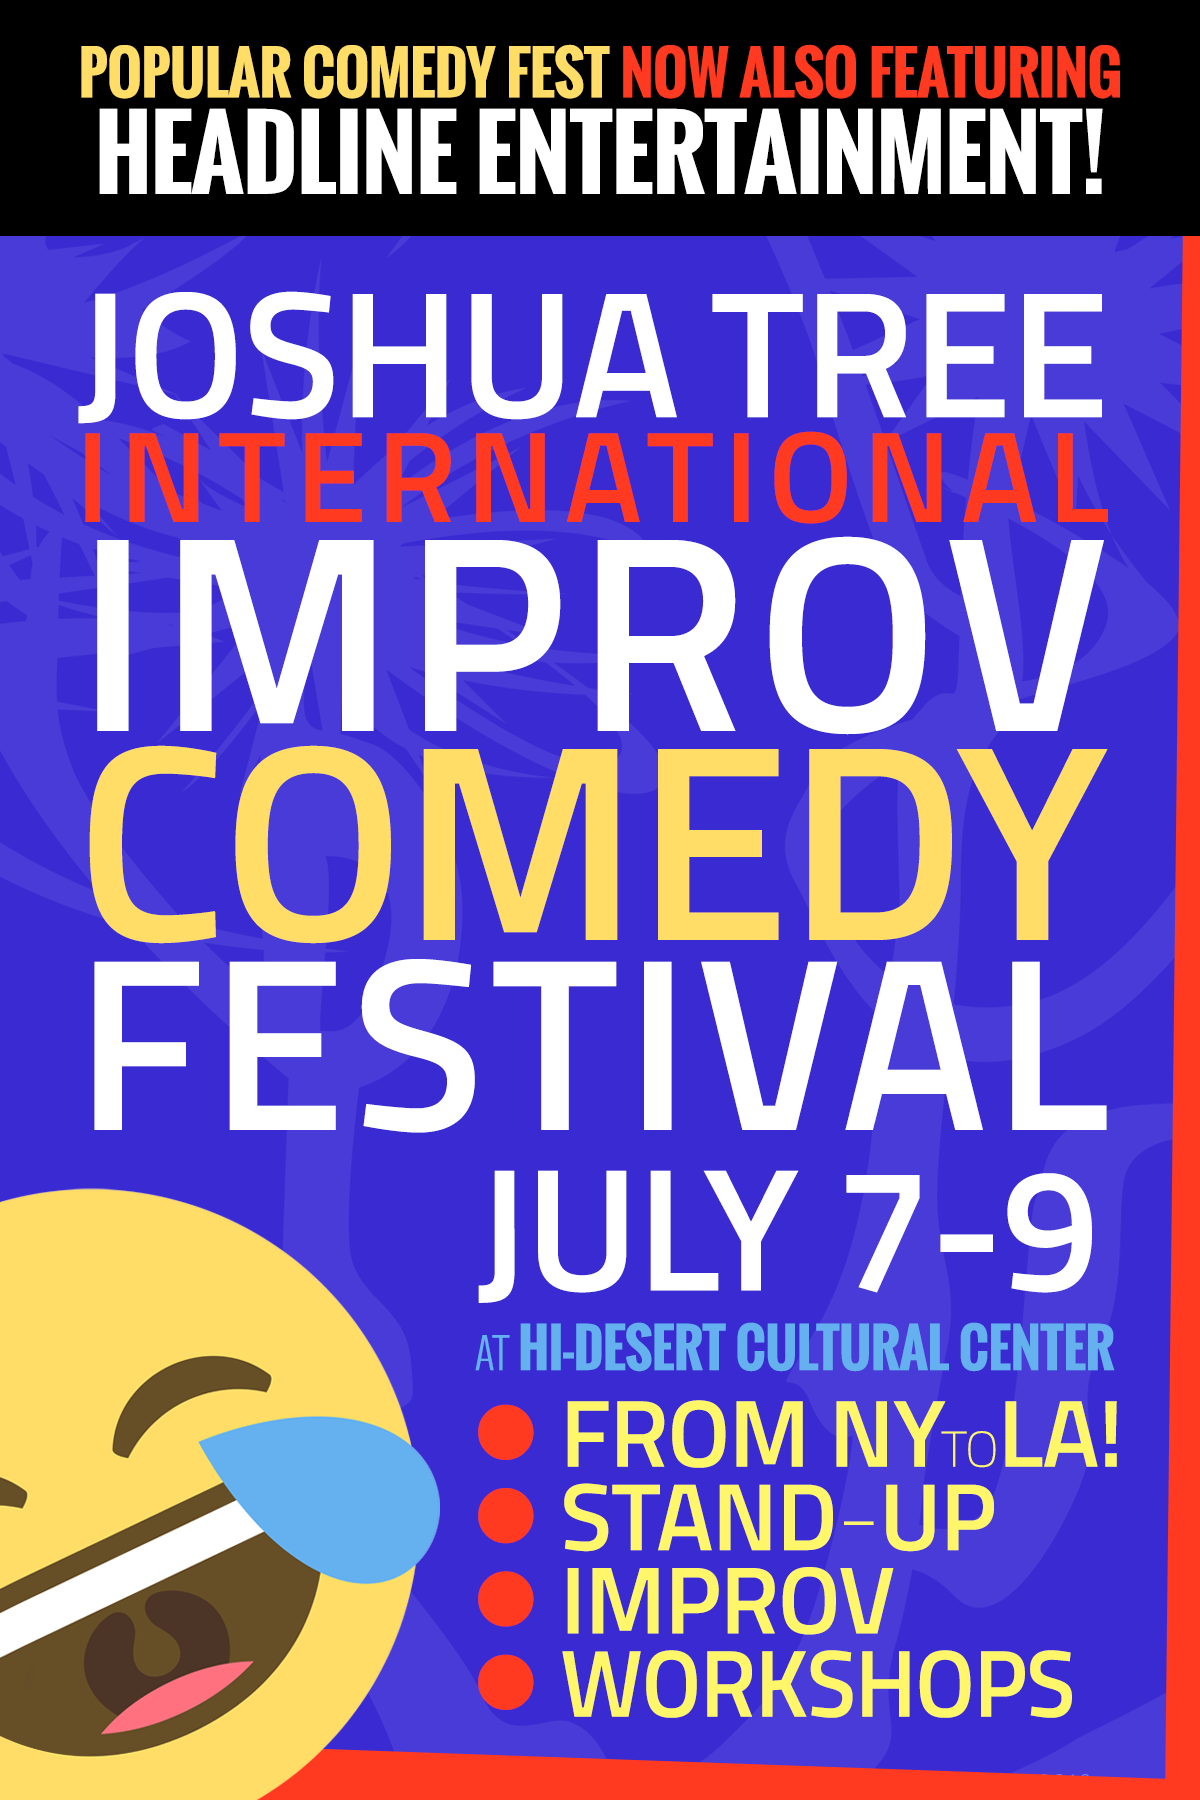 Comedy-Fest-2017-Postcard-FRONT